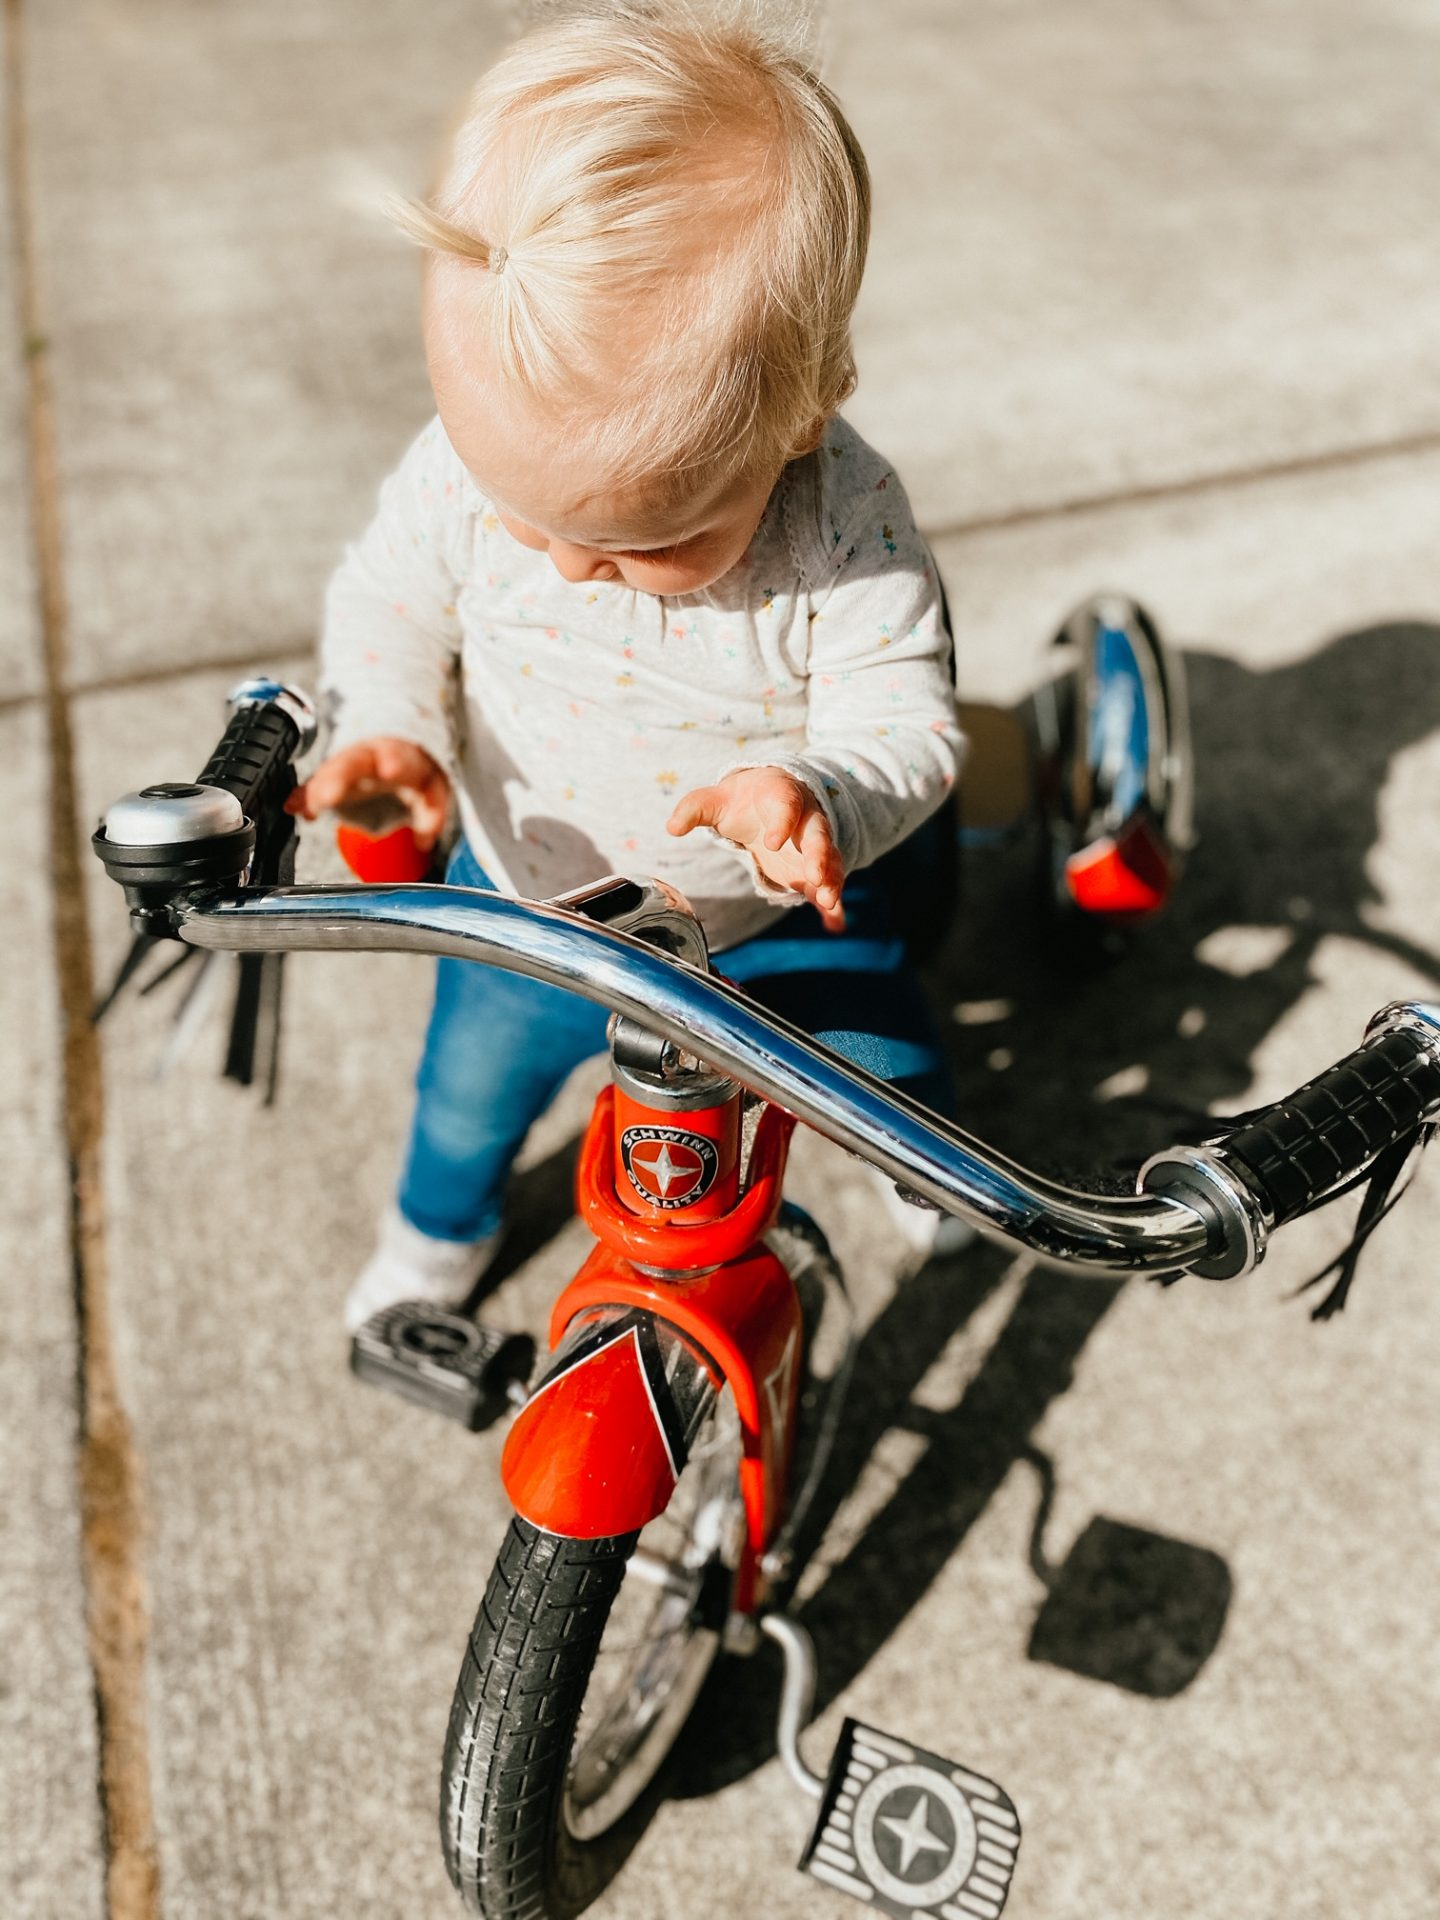 biking girl